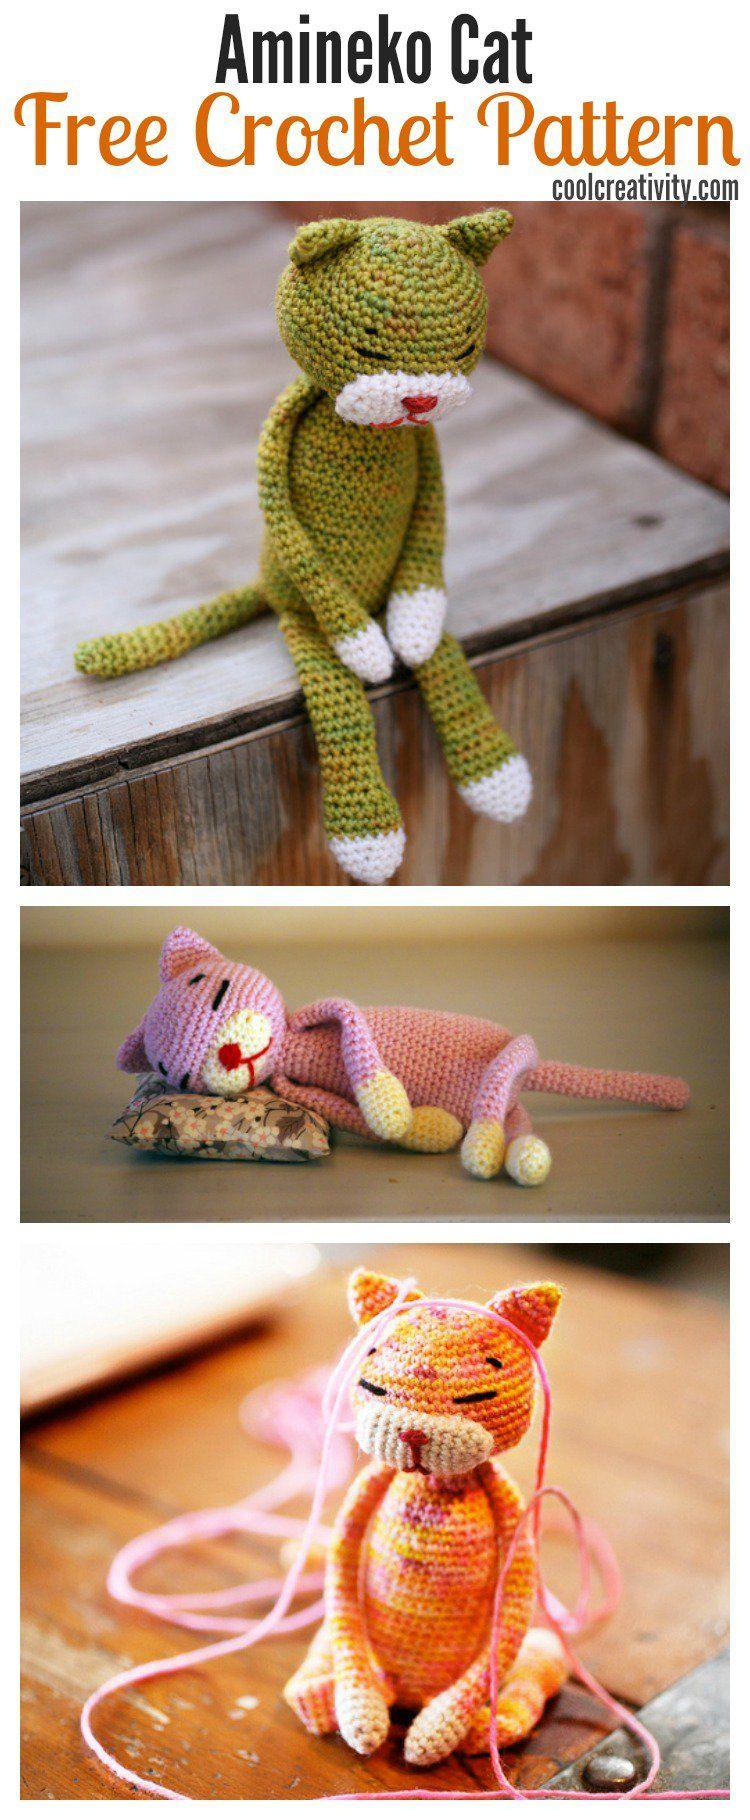 Crochet Amineko Cat With Free Pattern Knitting Pinterest